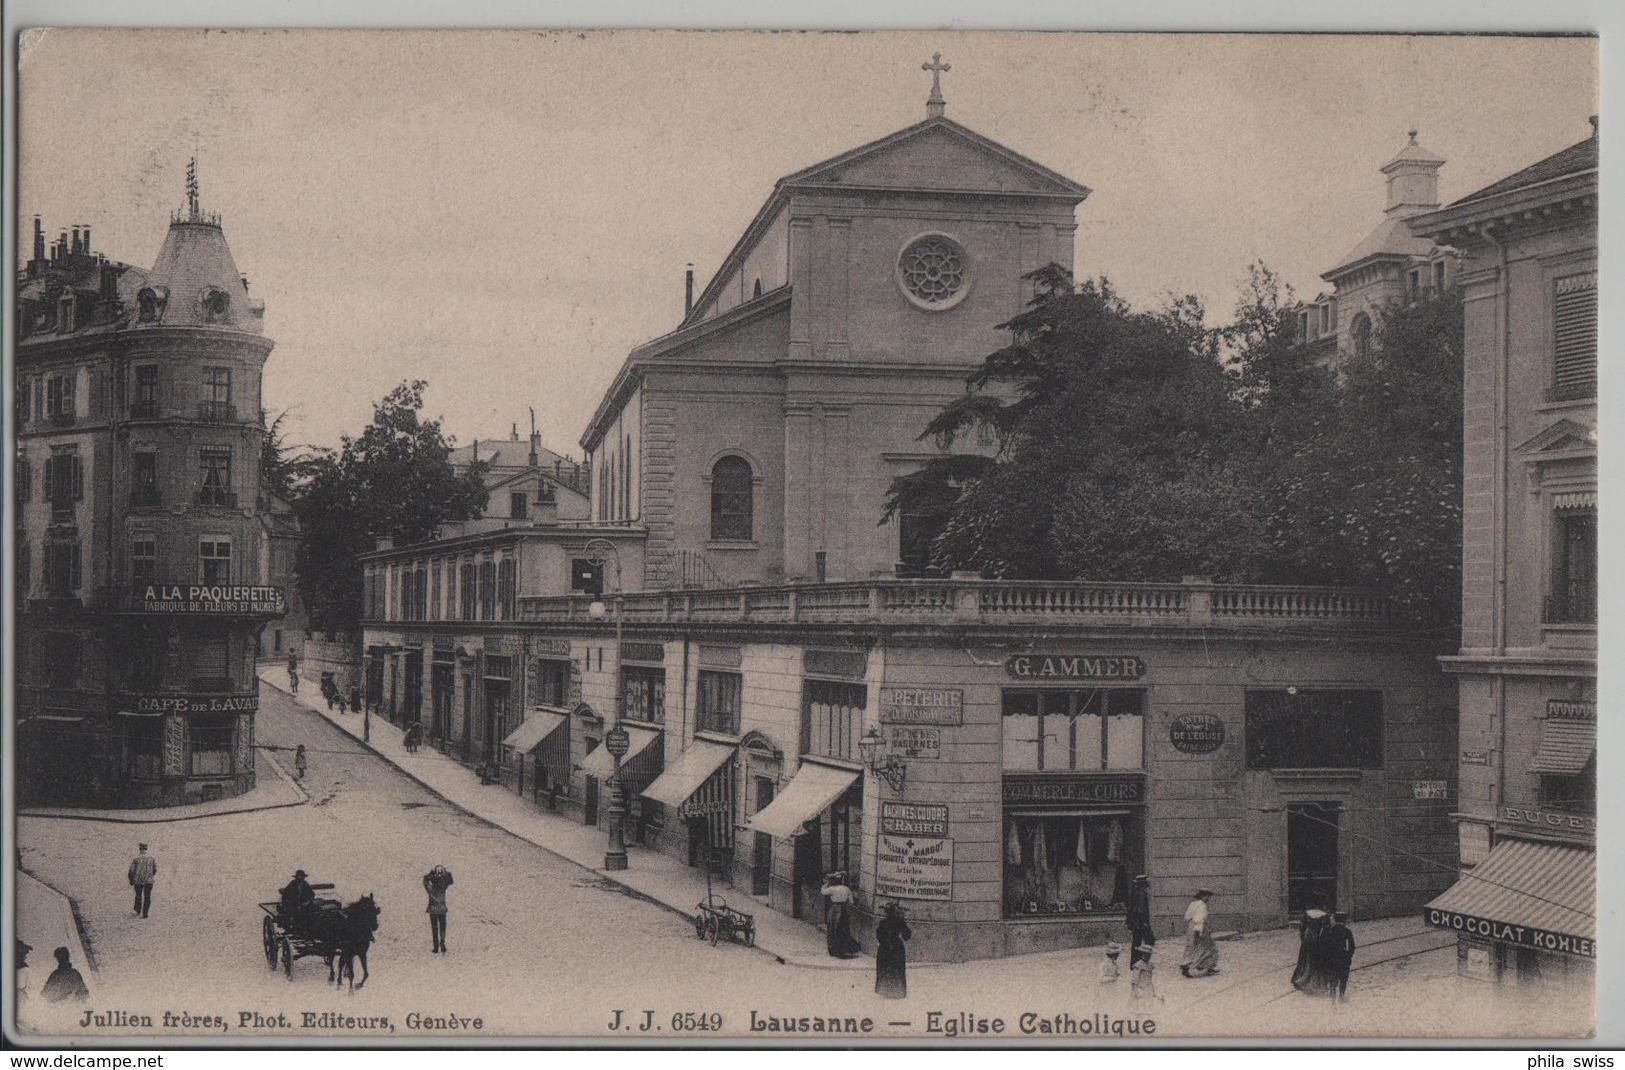 Lausanne - Eglise Catholique - G. Ammer - Animee - Photo: Jullien Freres - VD Vaud